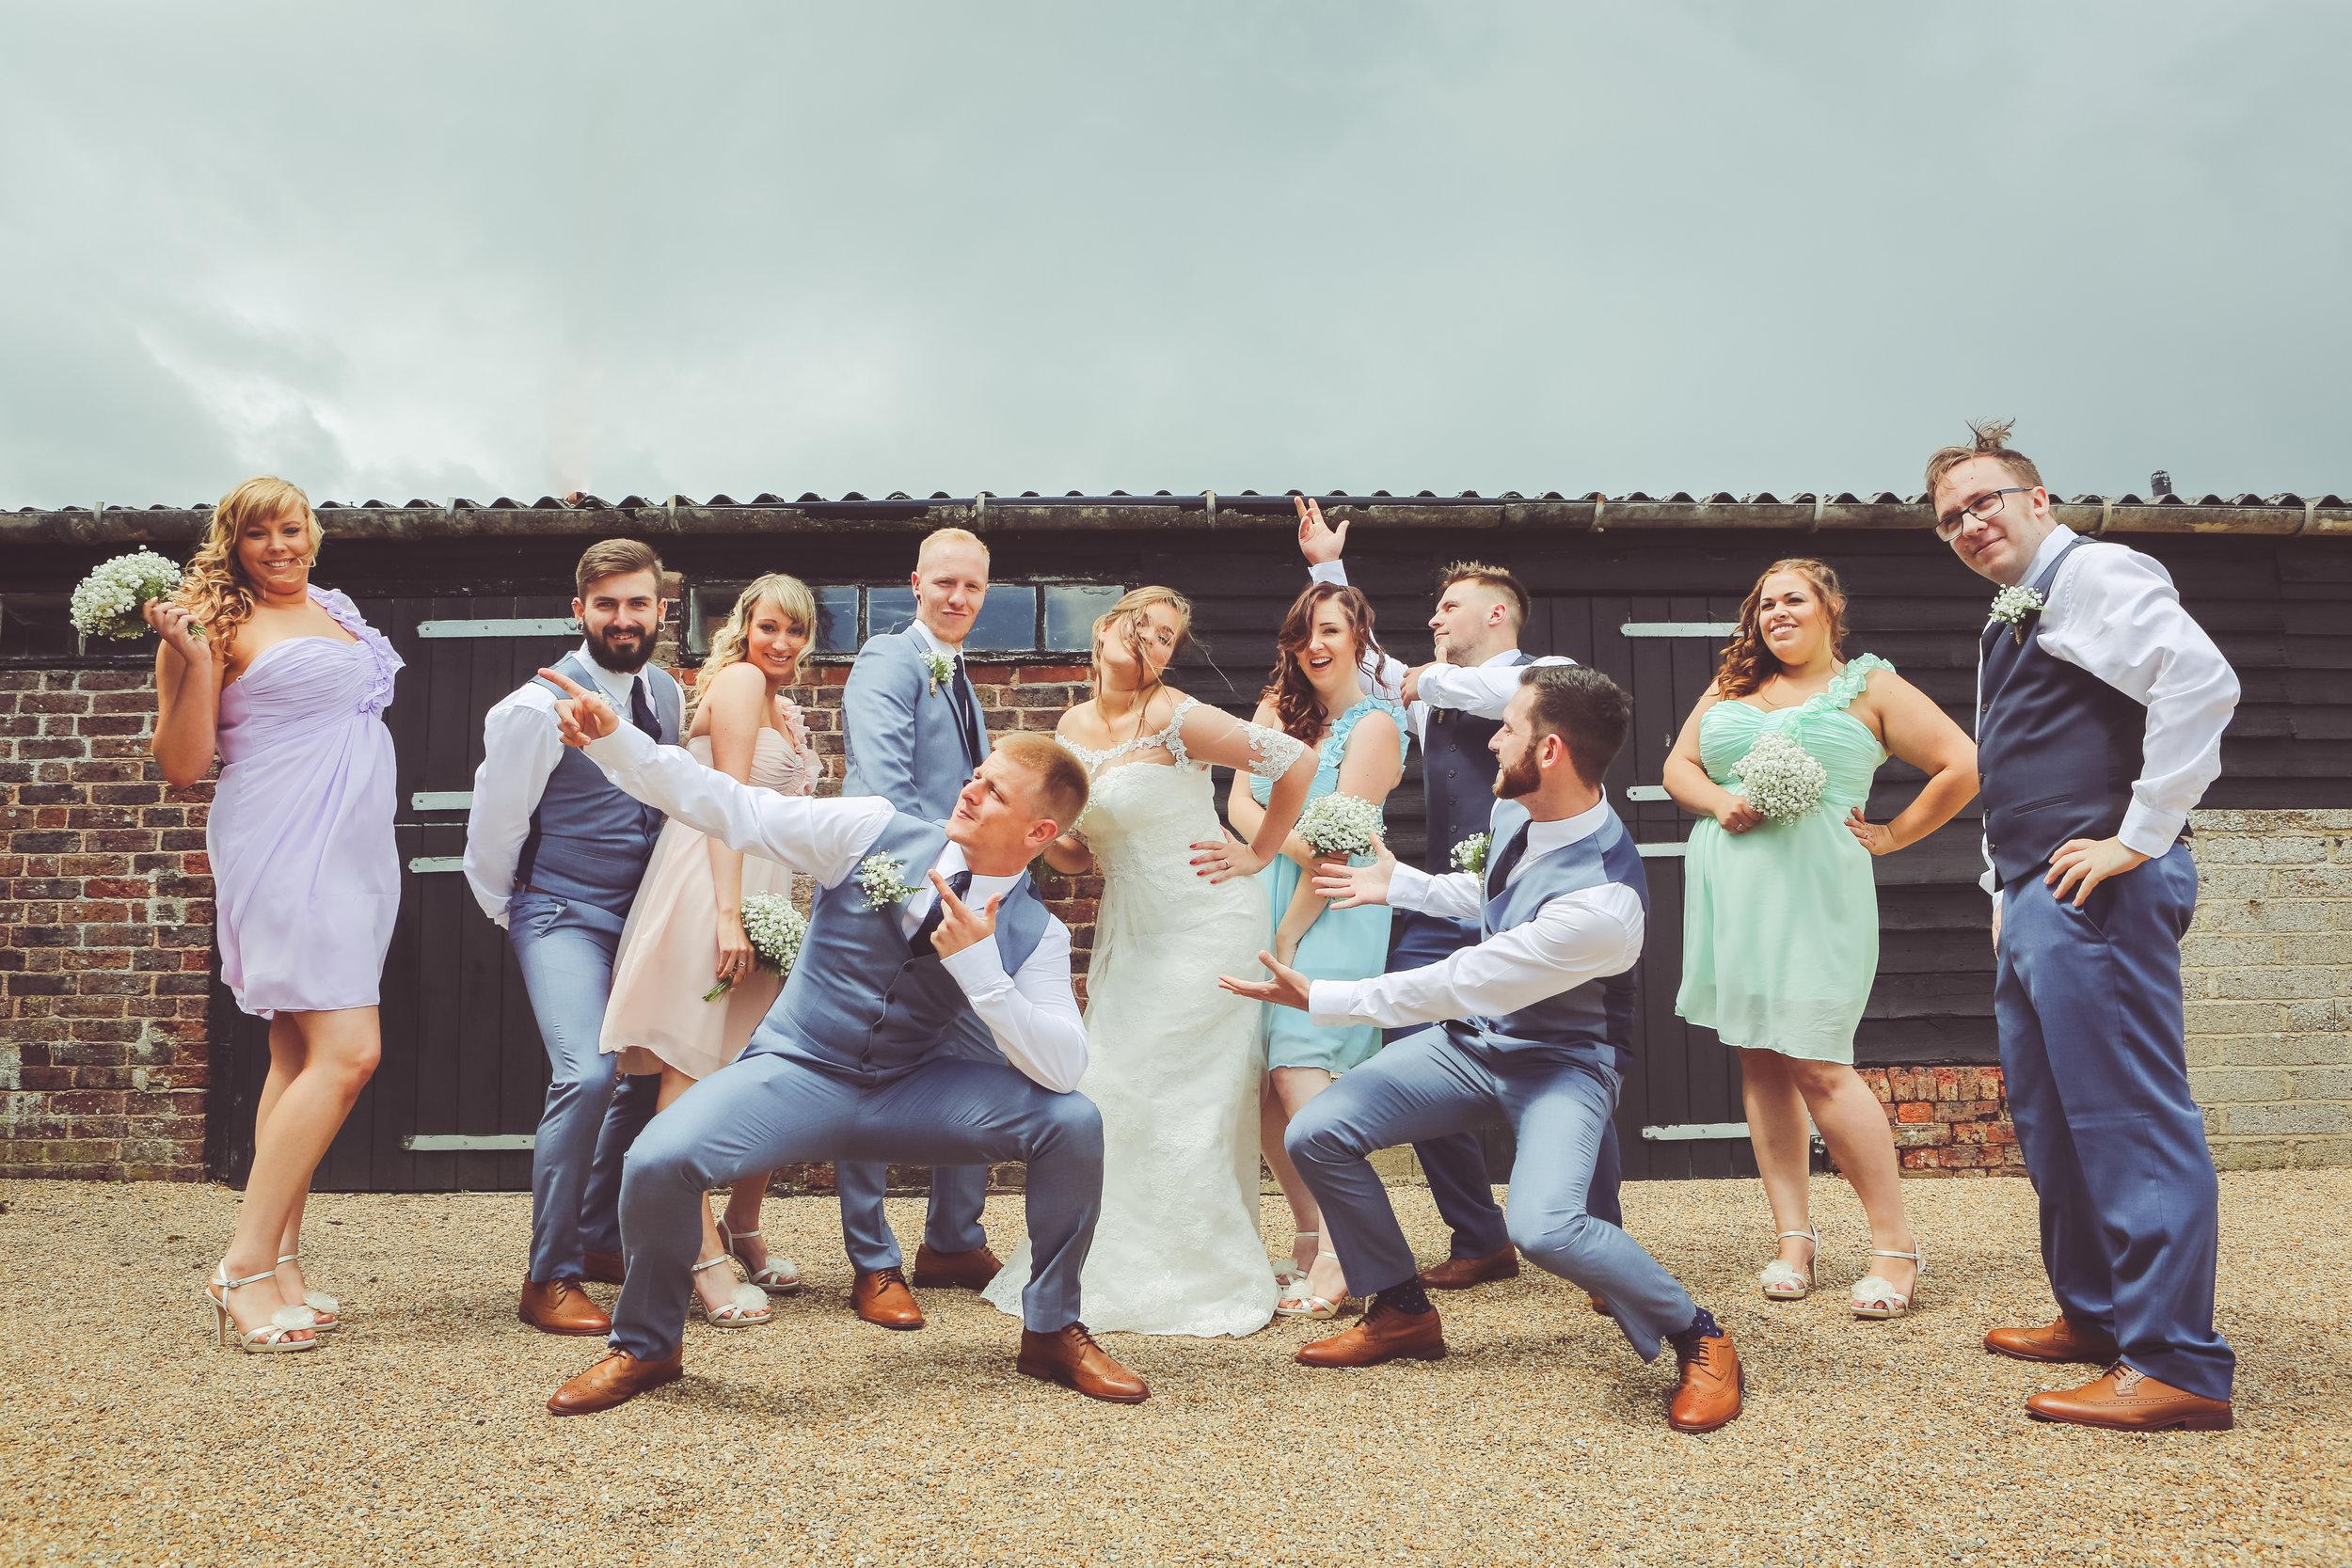 Amy & Adam Wedding - July 2nd 2016 Sussex BarnAmy & Adam Wedding - Sussex BarnFRNH1735.jpg